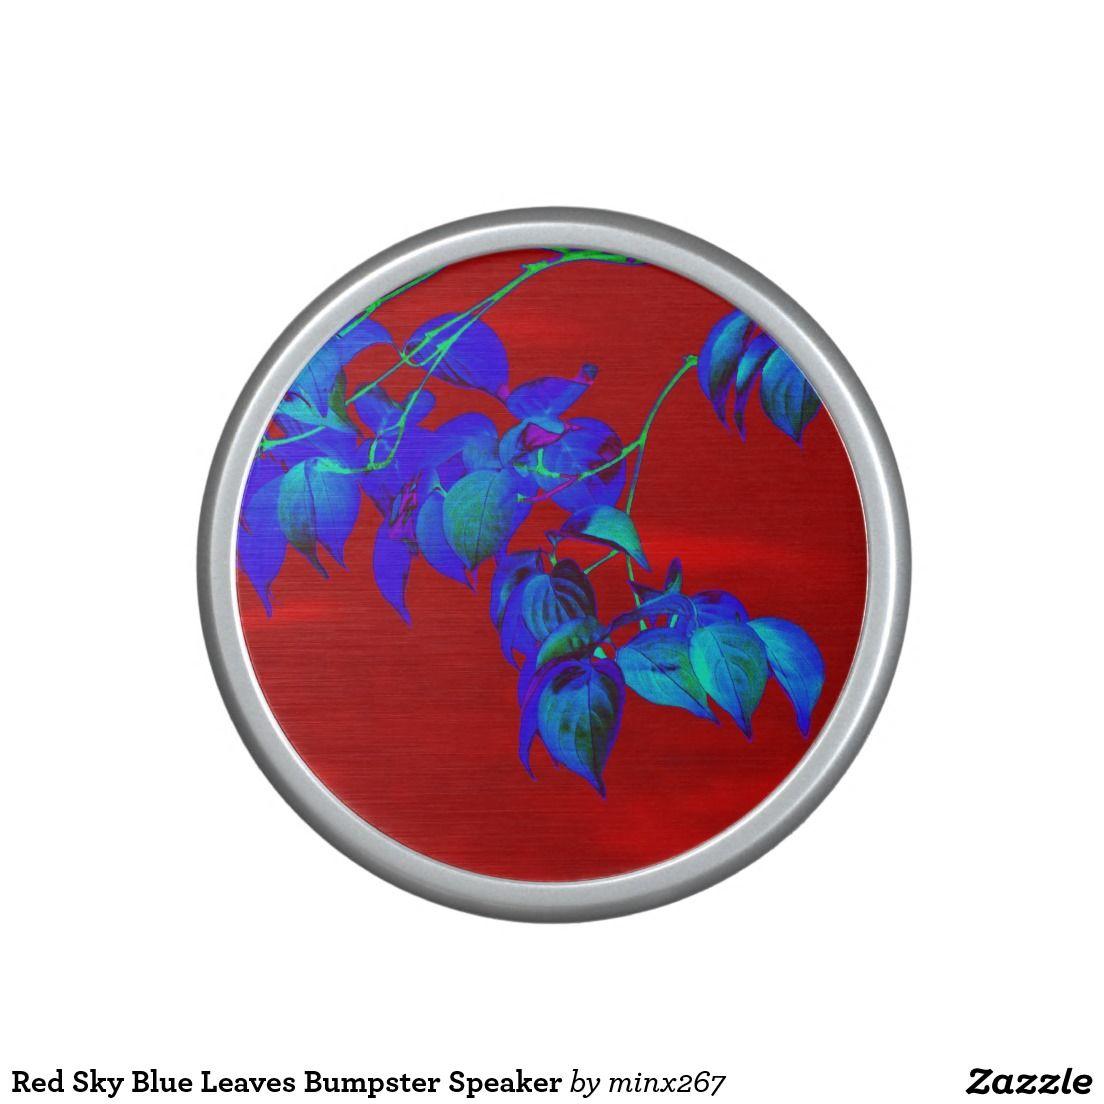 Red Sky Blue Leaves Bumpster Speaker